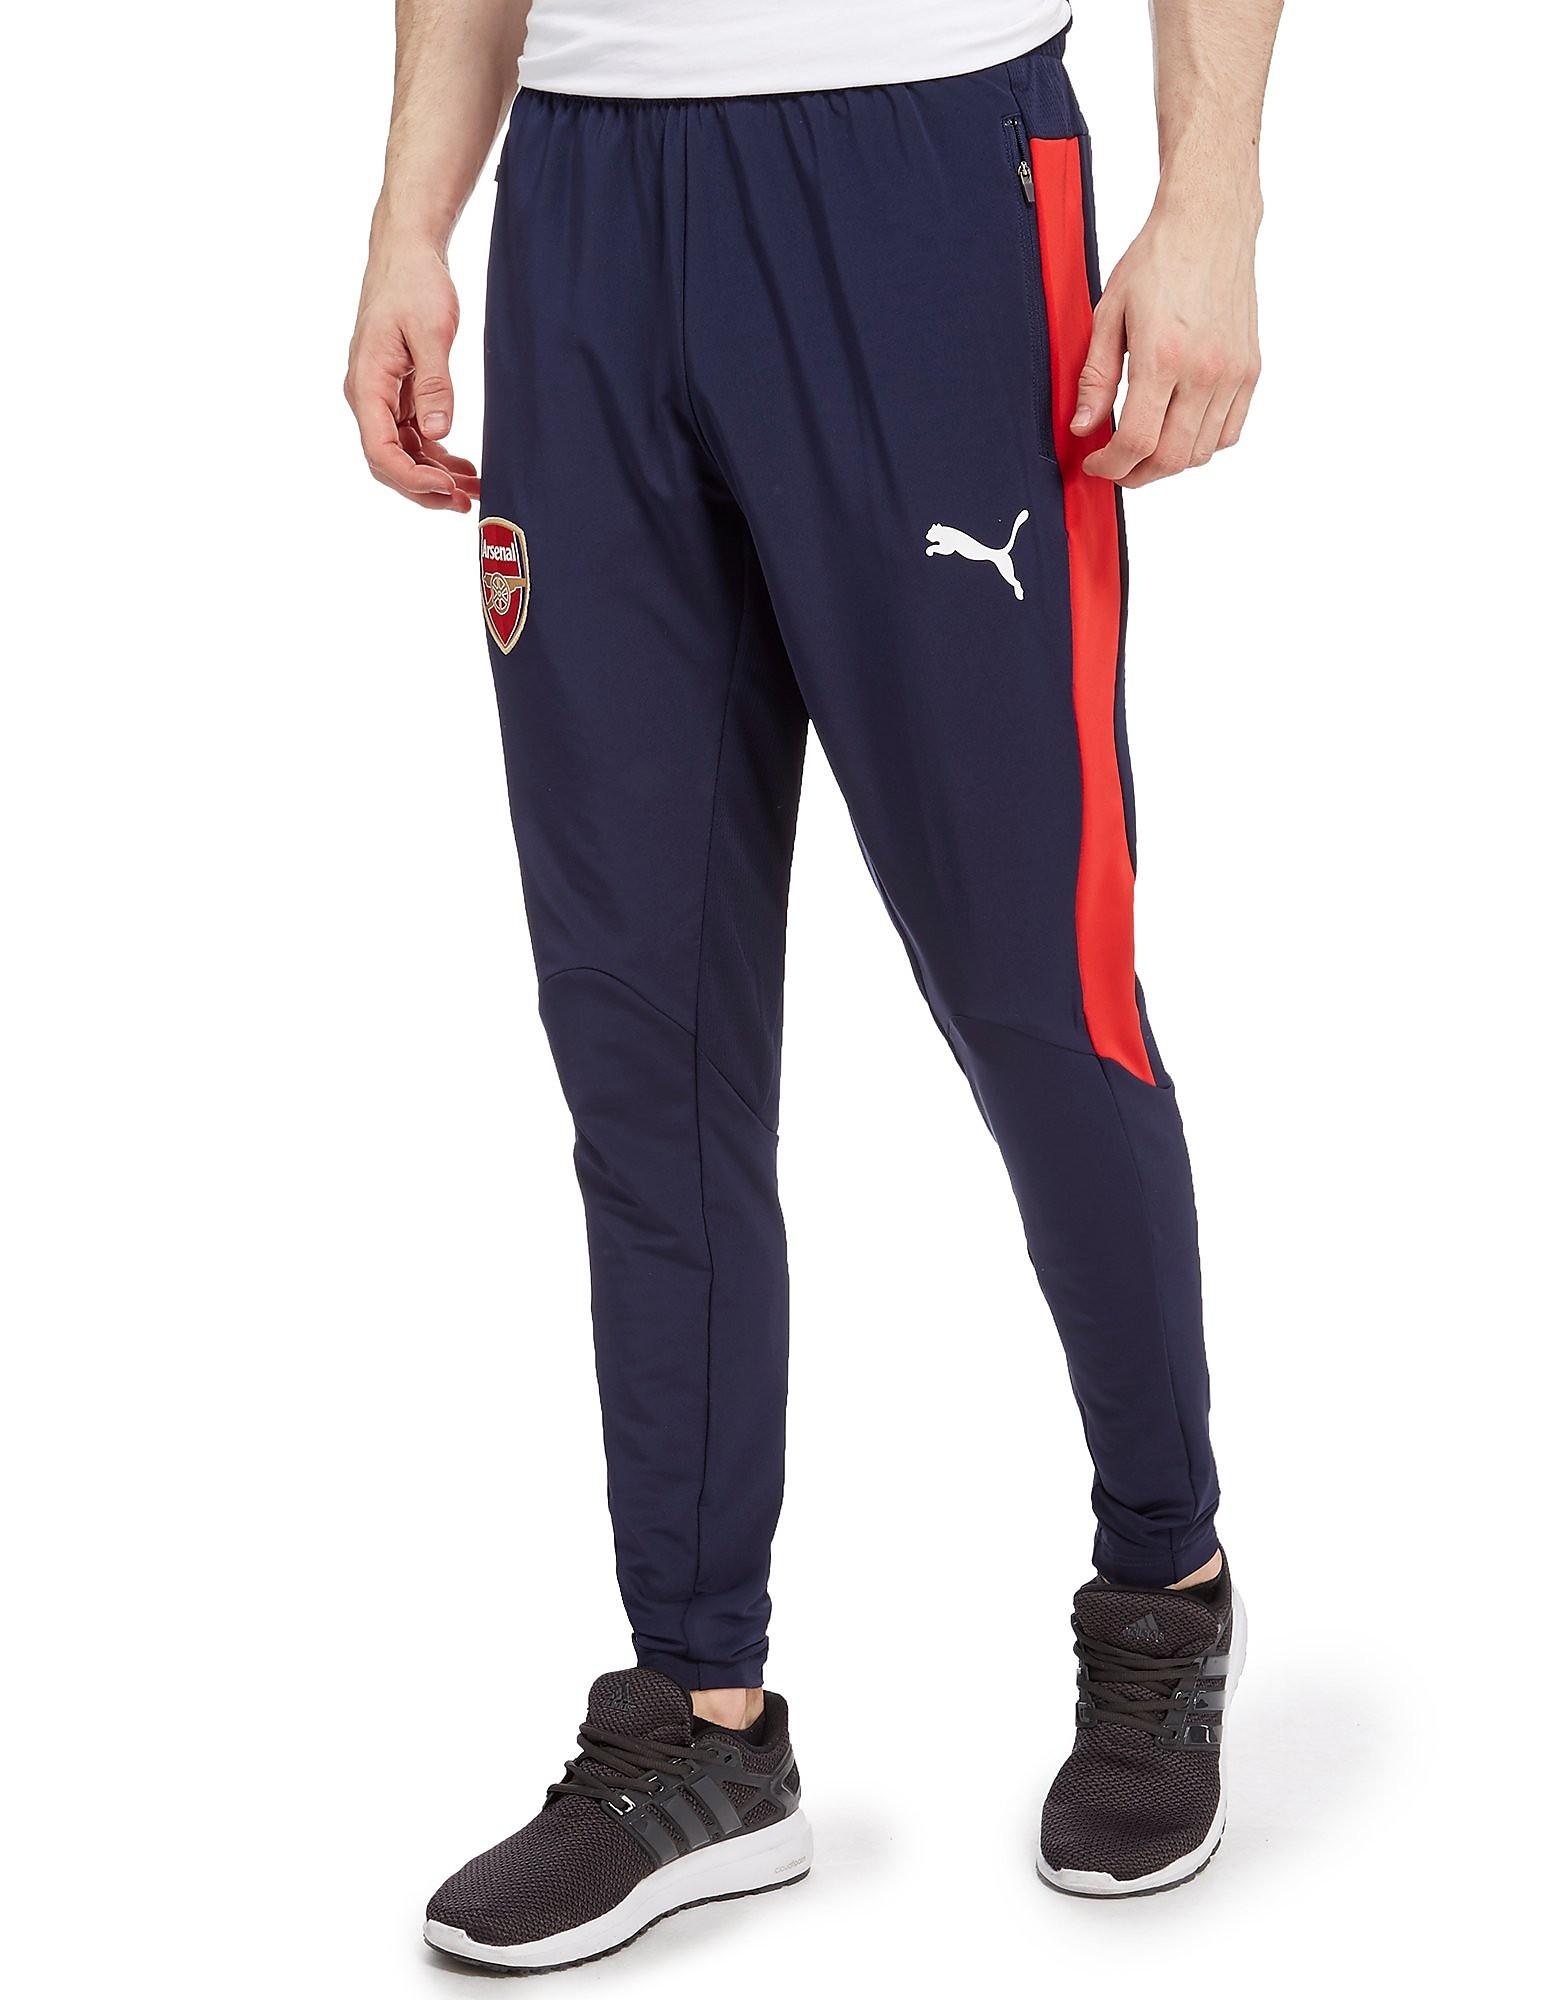 PUMA Arsenal FC Training Pants